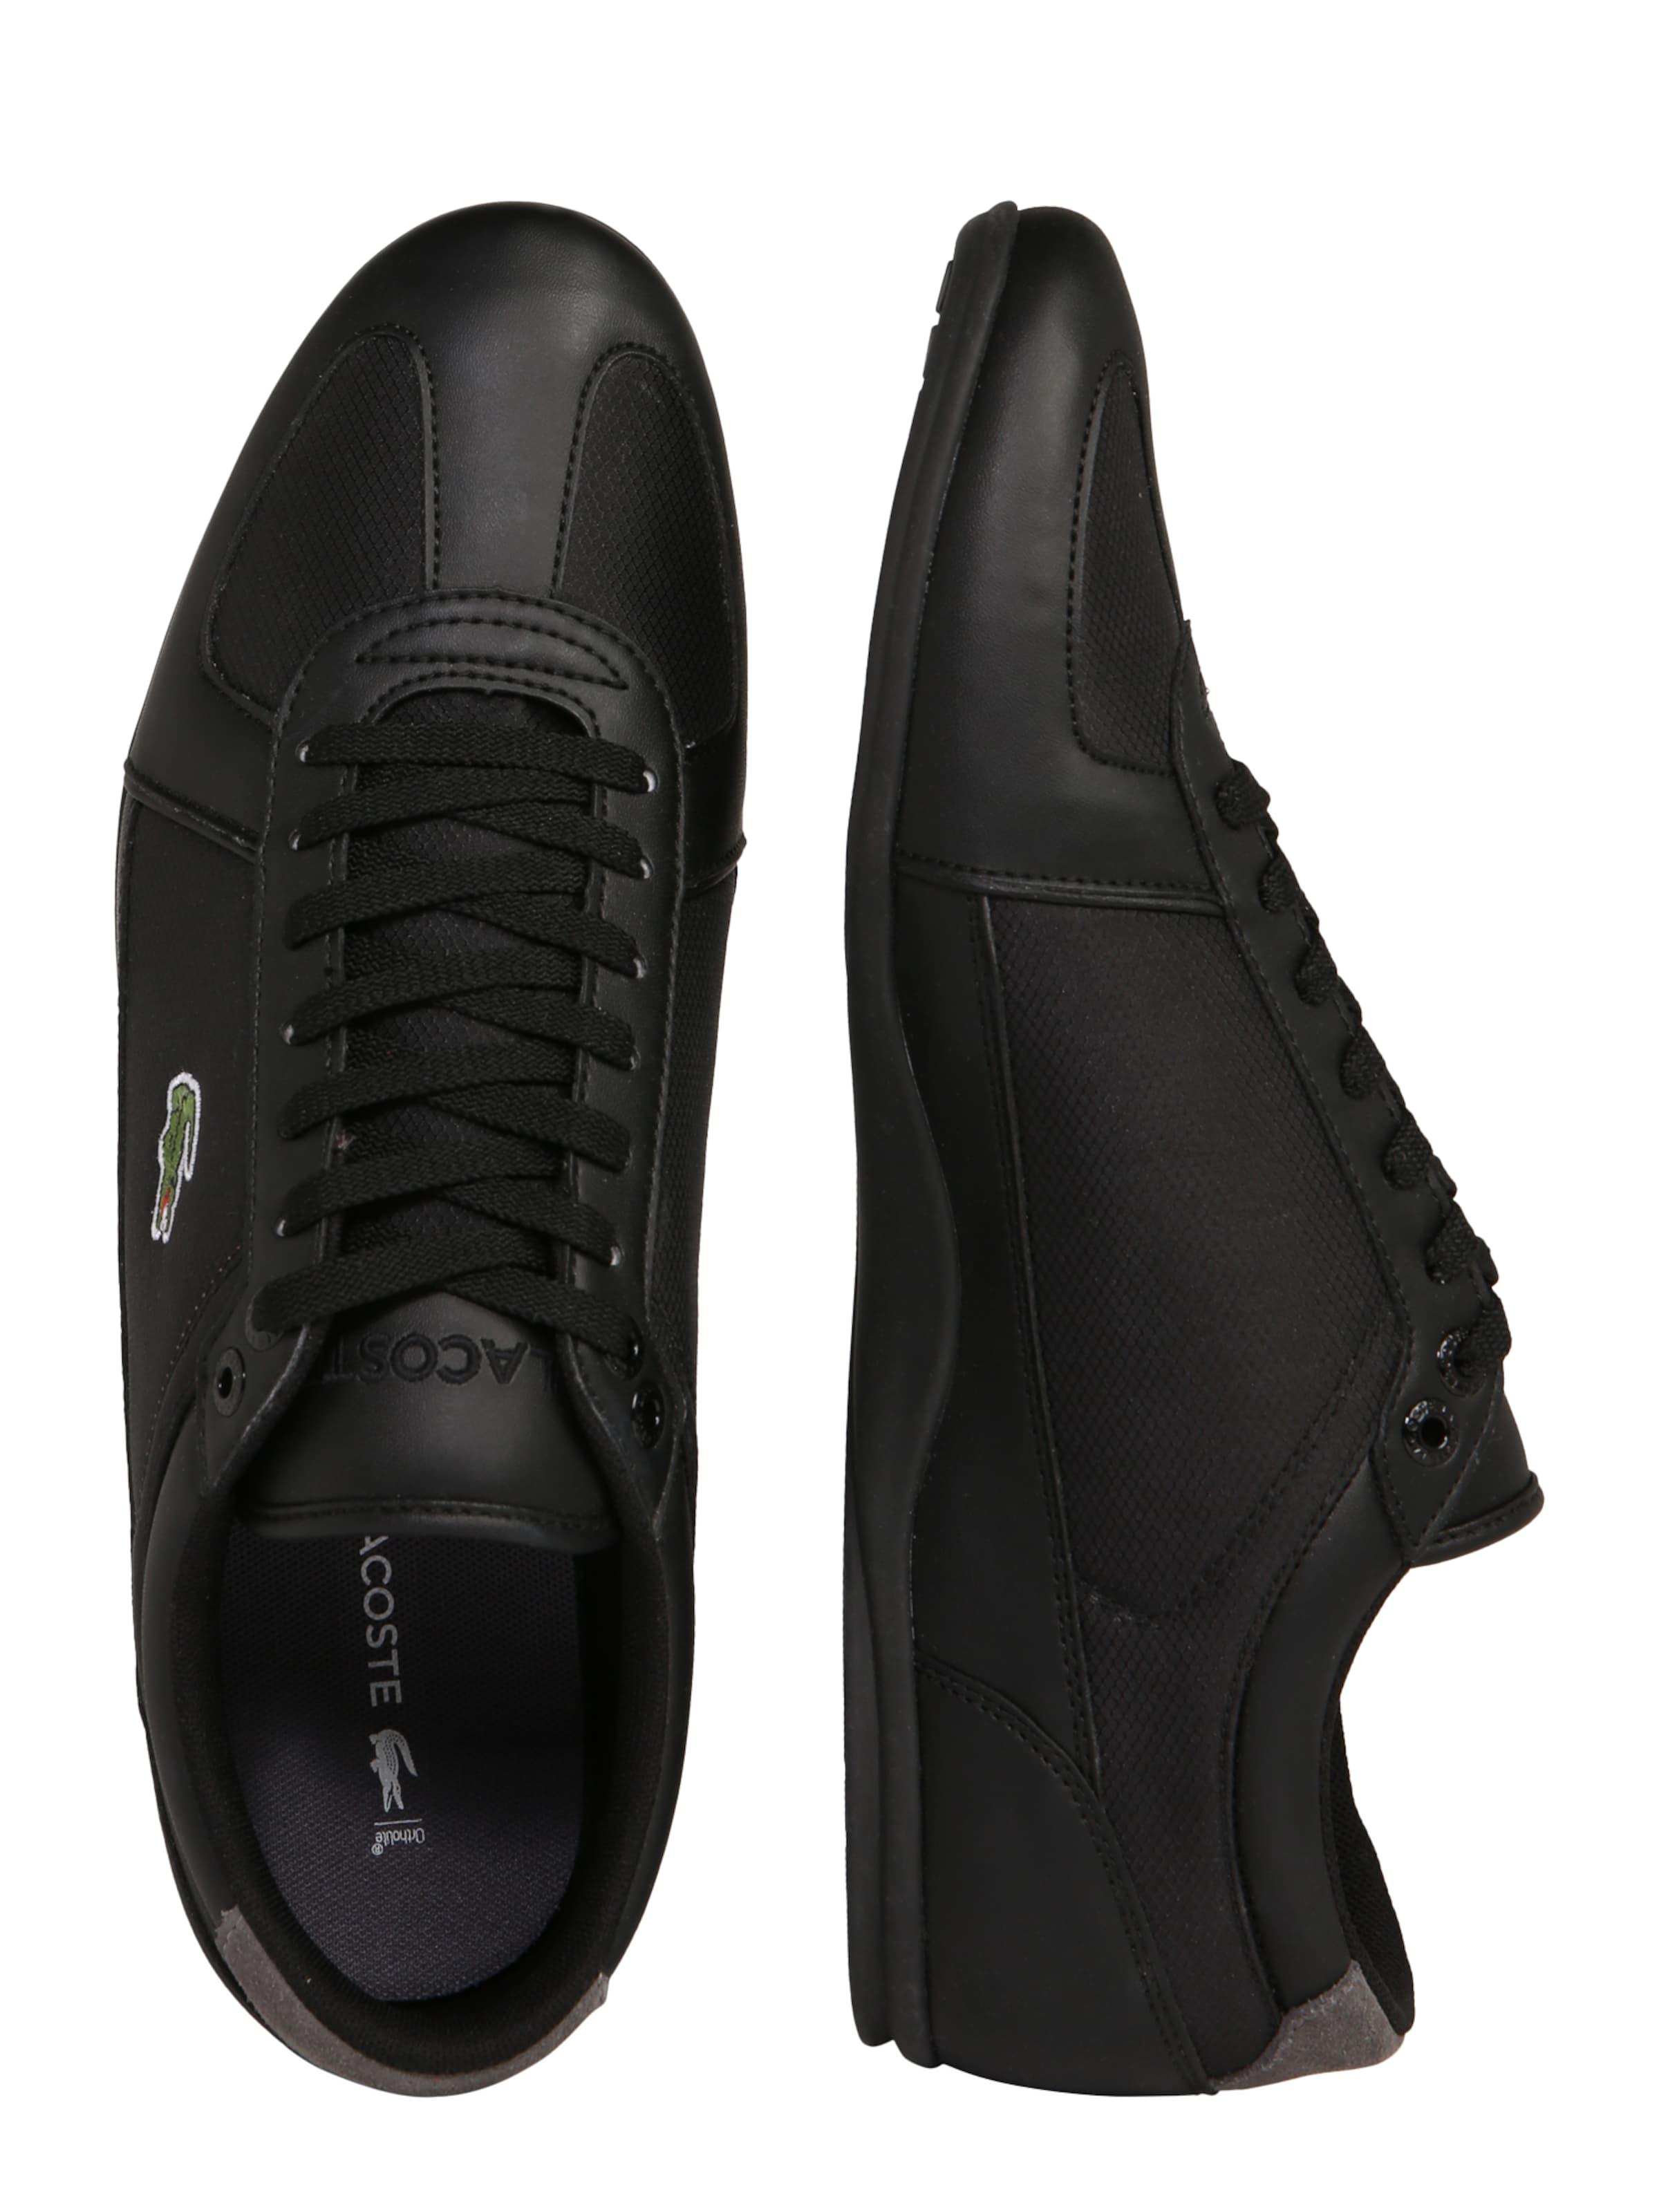 Cma' 'evara Sport 1 In DunkelgrauSchwarz 119 Sneaker Lacoste 3FcTlKJ1